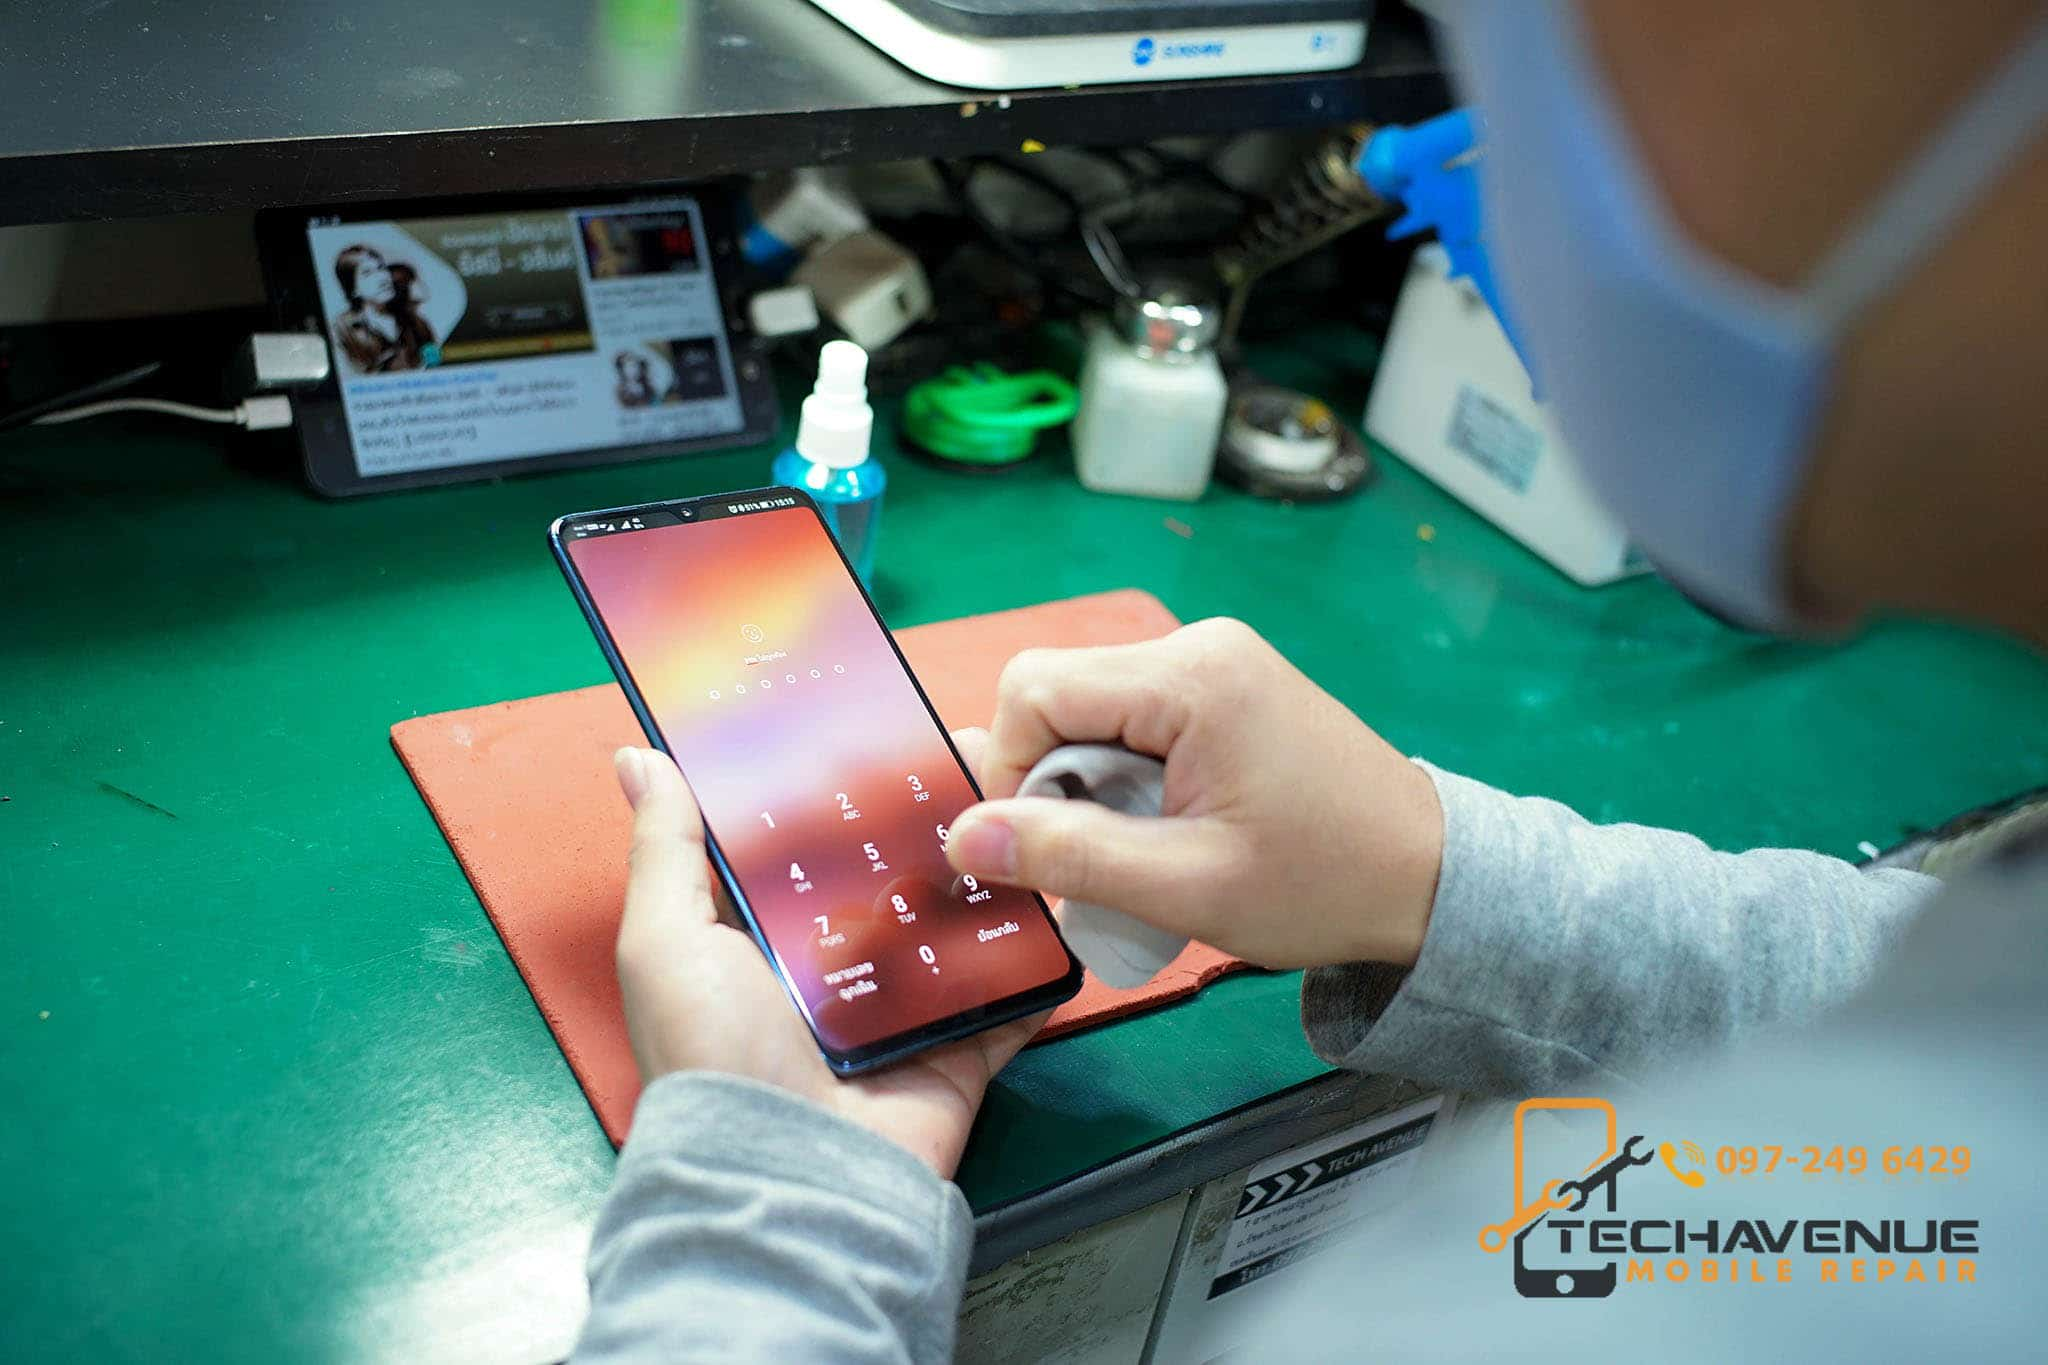 Huawei (หัวเว่ย) P20 เครื่องร้อน ส่งซ่อมมือถือร้านไหนดีที่สุด